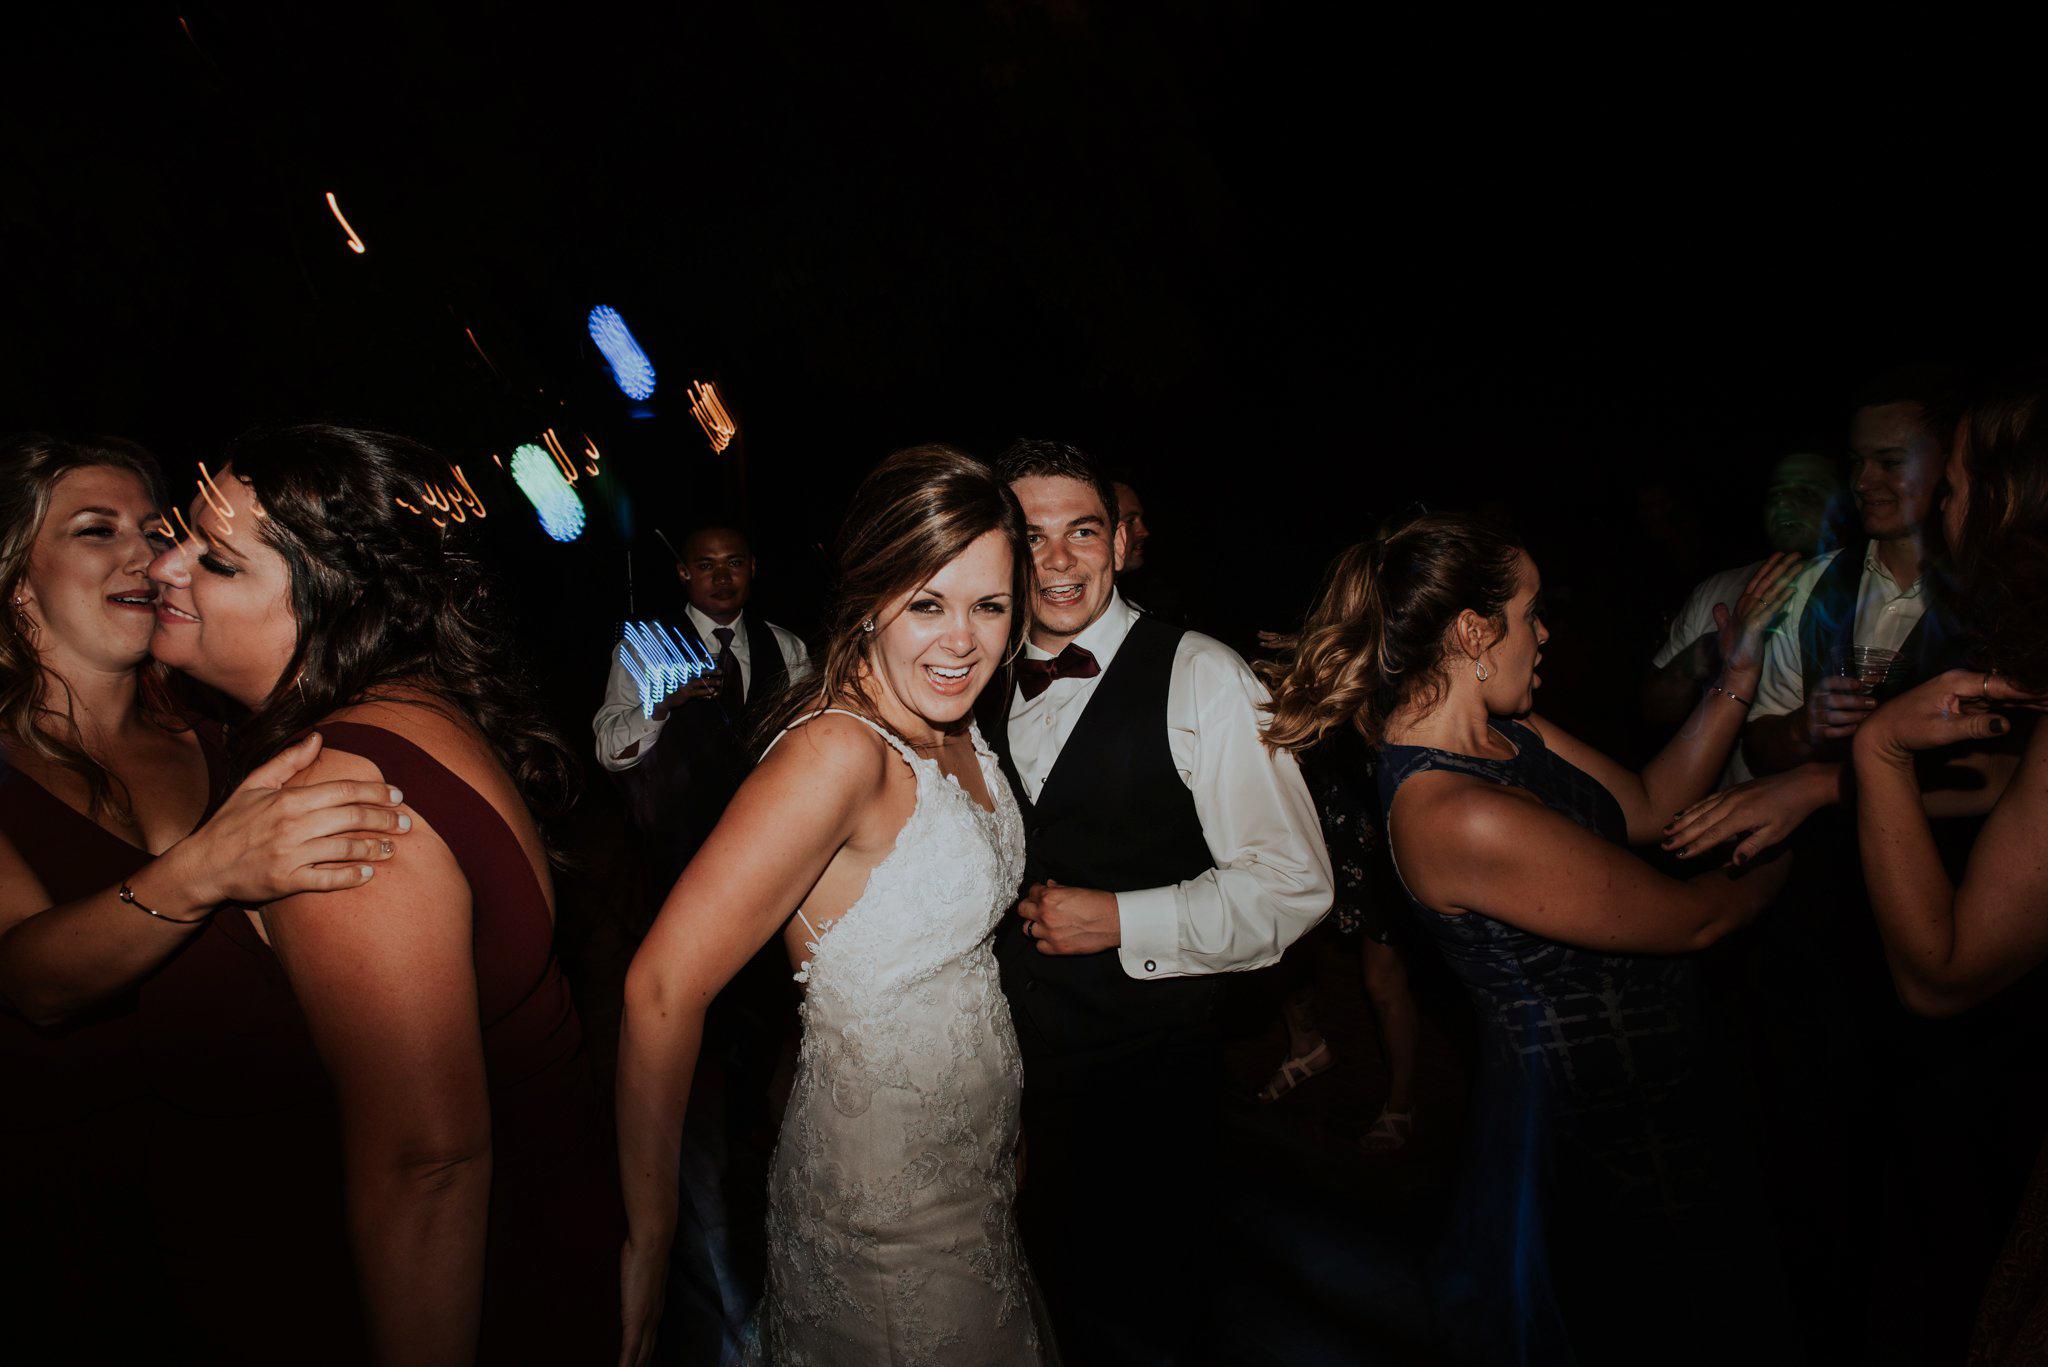 kristen-and-cody-the-kelley-farm-wedding-seattle-photographer-caitlyn-nikula-125.jpg